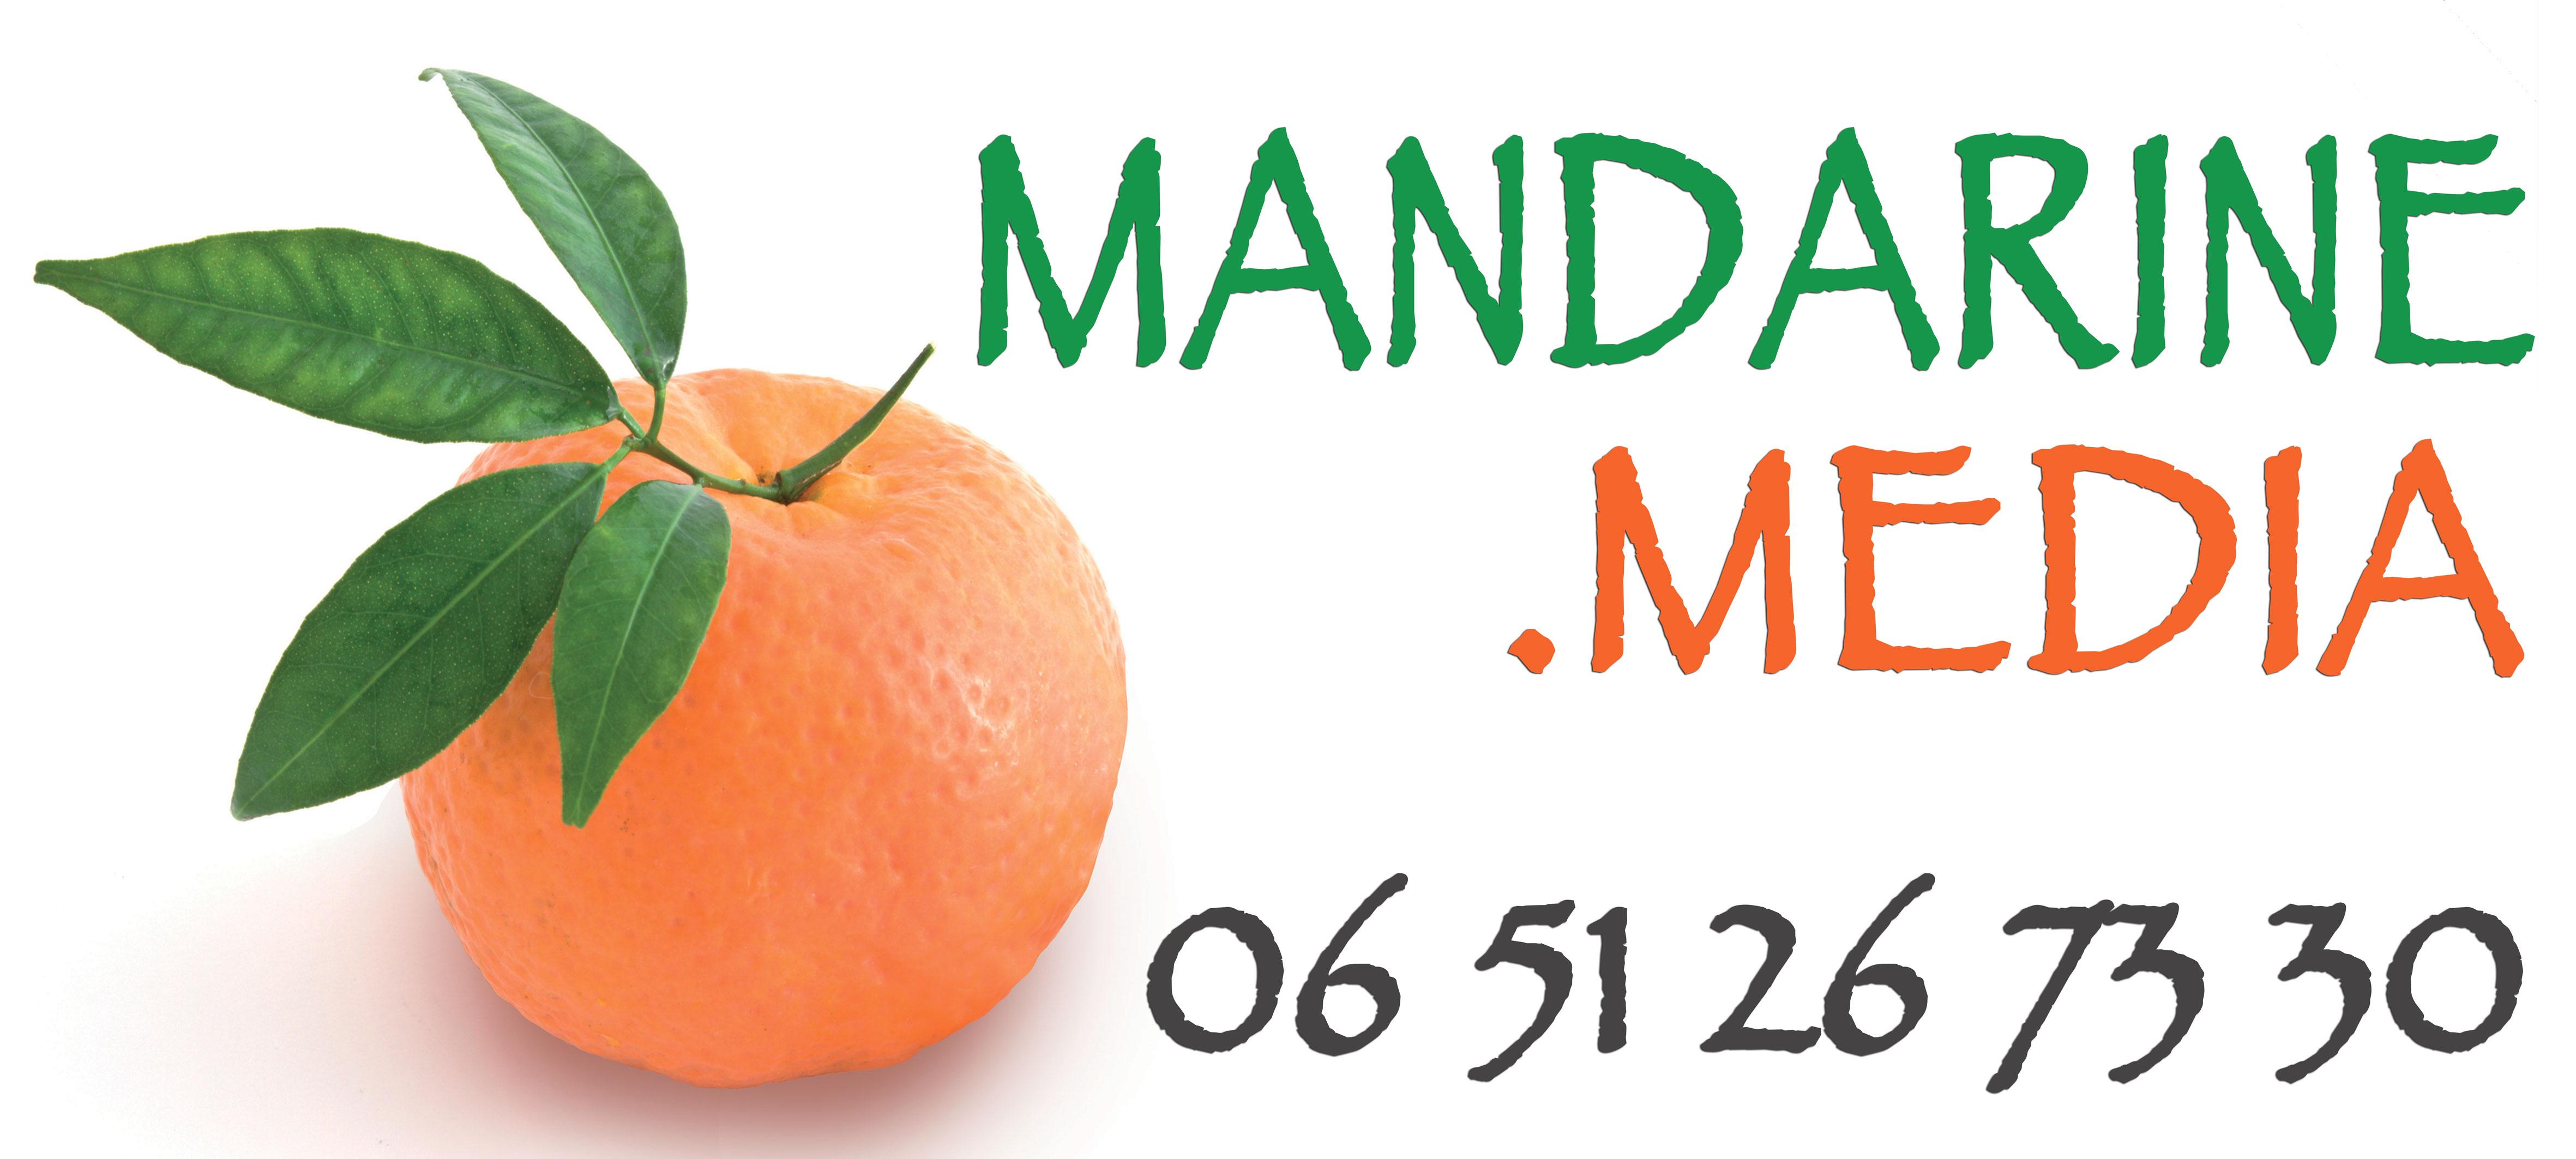 Mandarine Média